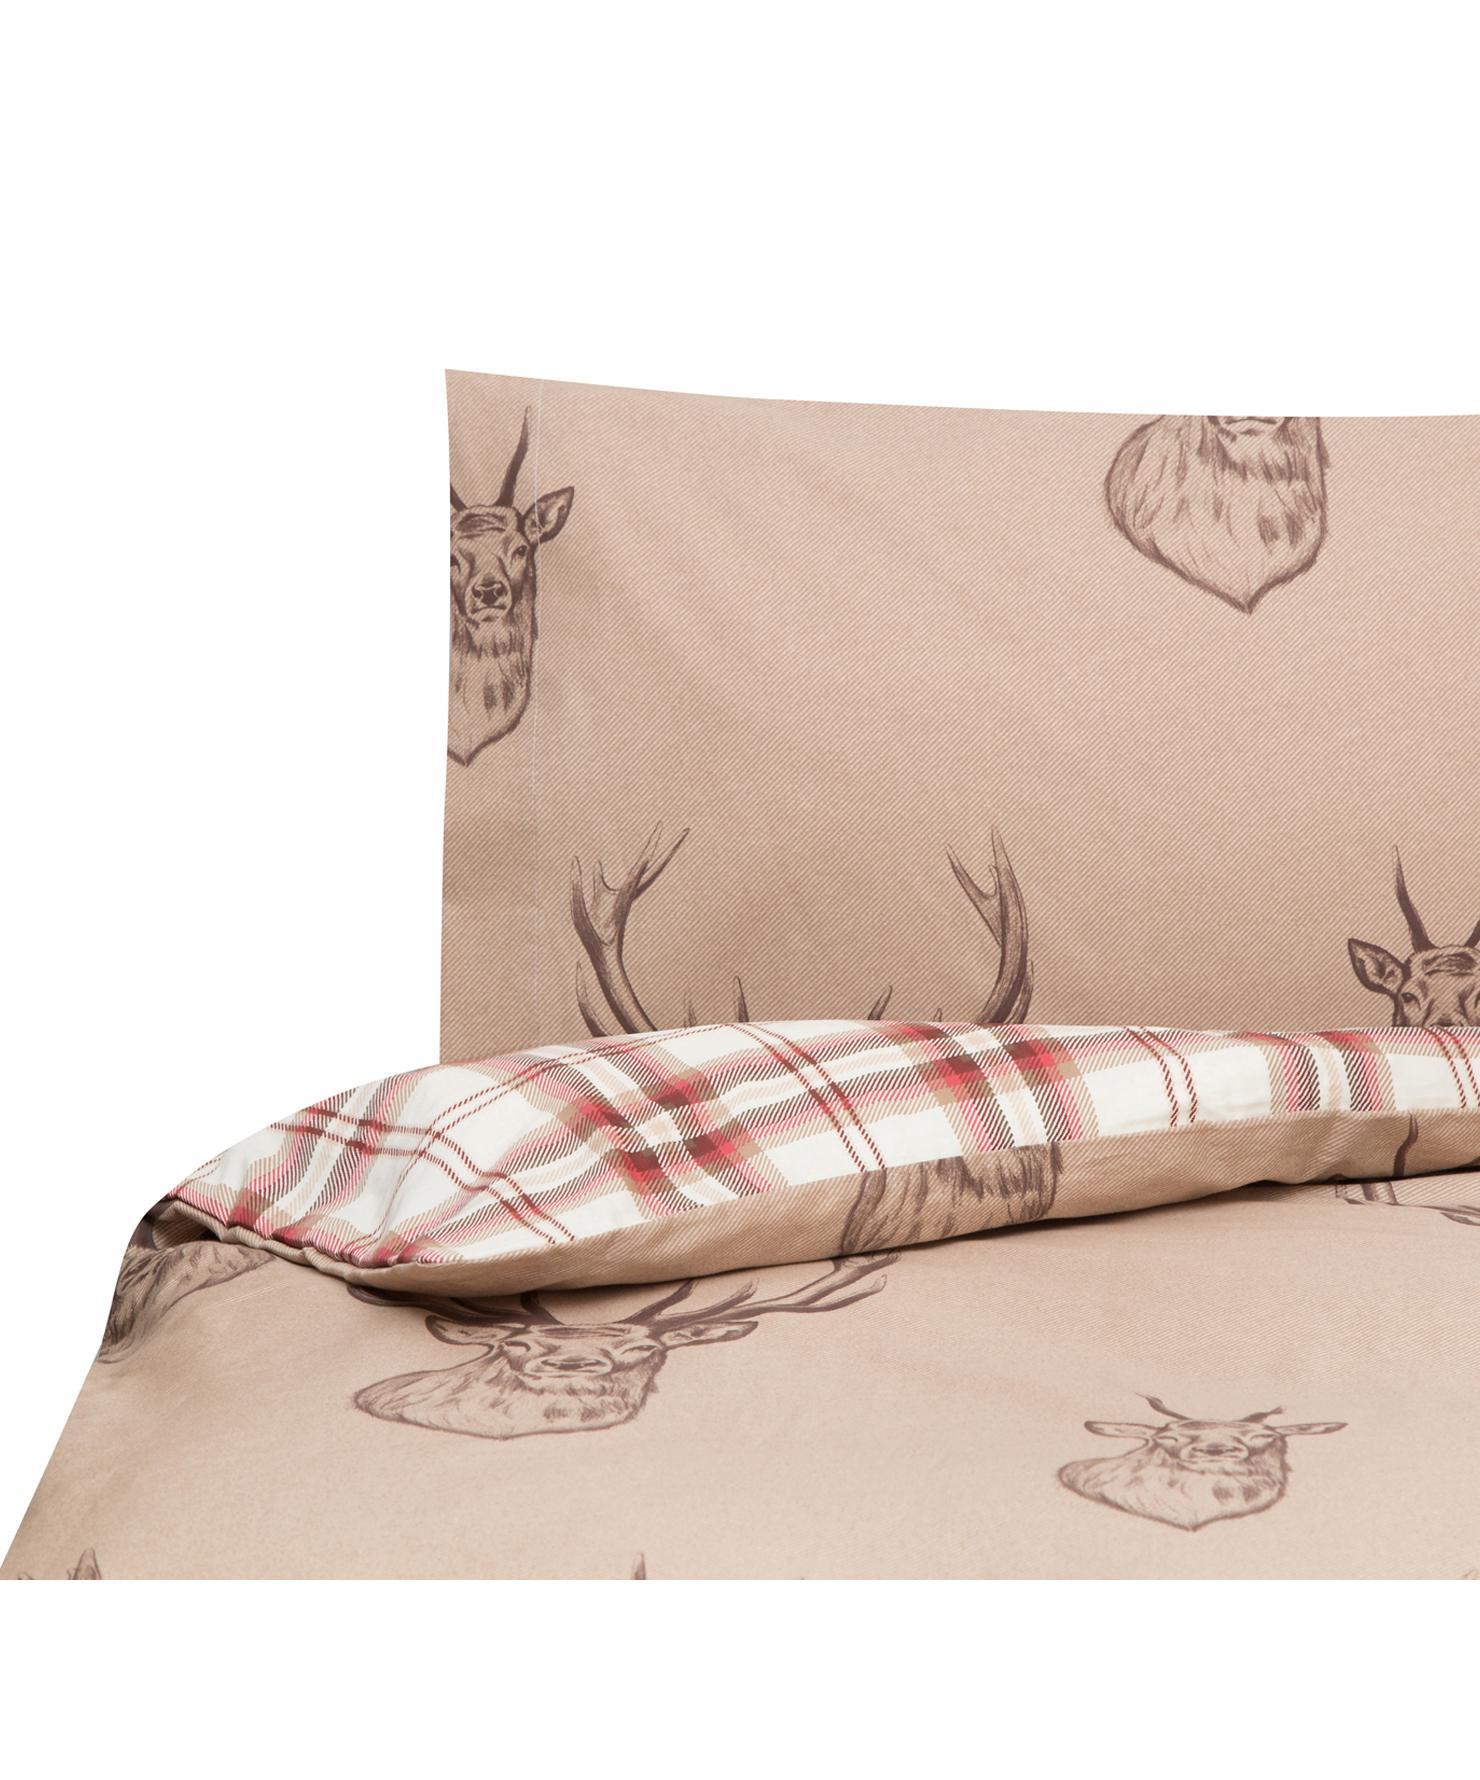 Funda nórdica Stags, Algodón, Tonos beige, rojo, blanco, Cama 90 cm (160 x 220 cm)